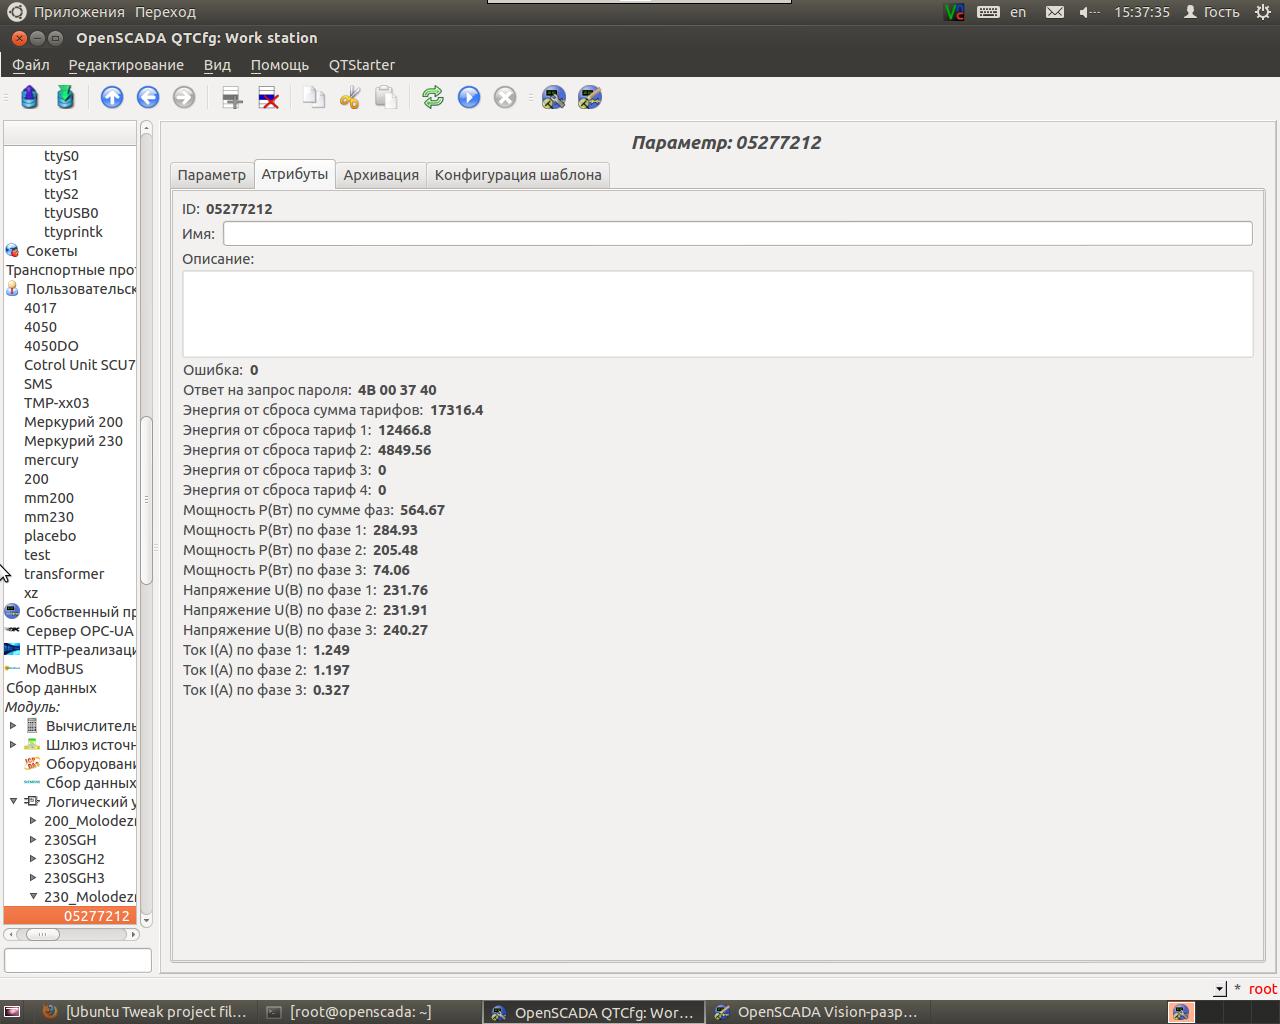 Пишем протоколы счетчиков Меркурий 230 и Меркурий 200 для OpenSCADA - 18